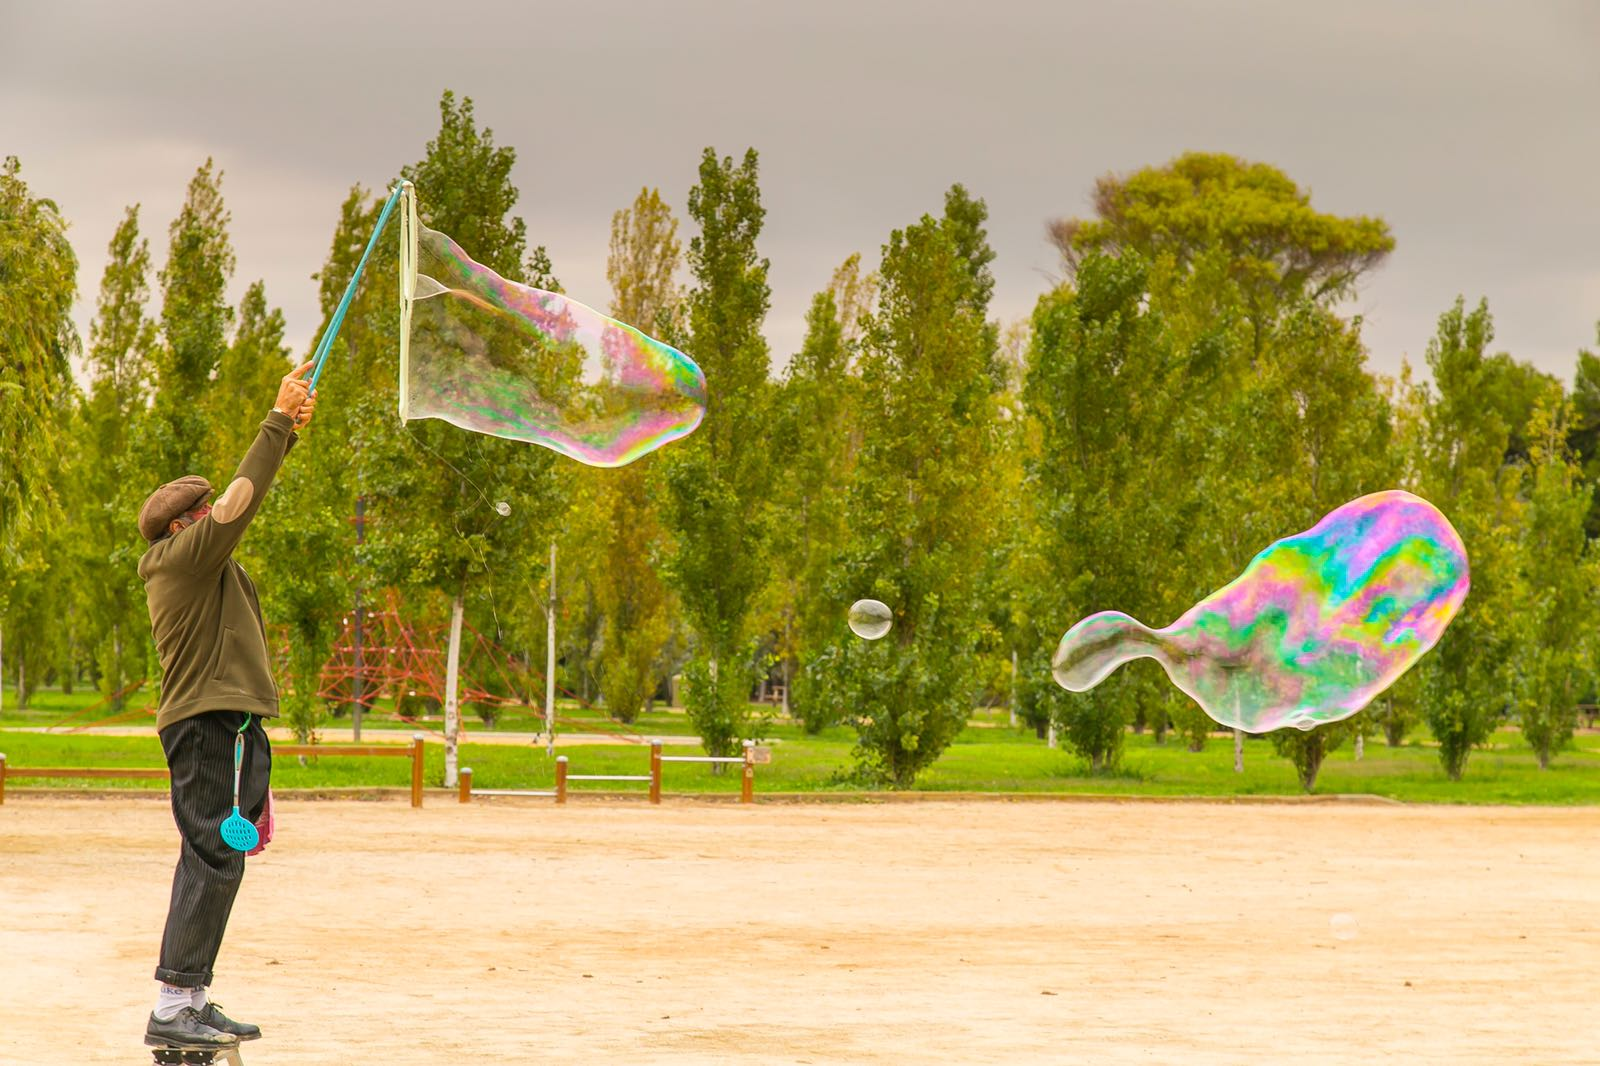 animación con burbujas gigantes en barcelona, show de burbujas, espectáculo con burbujas gigantes,